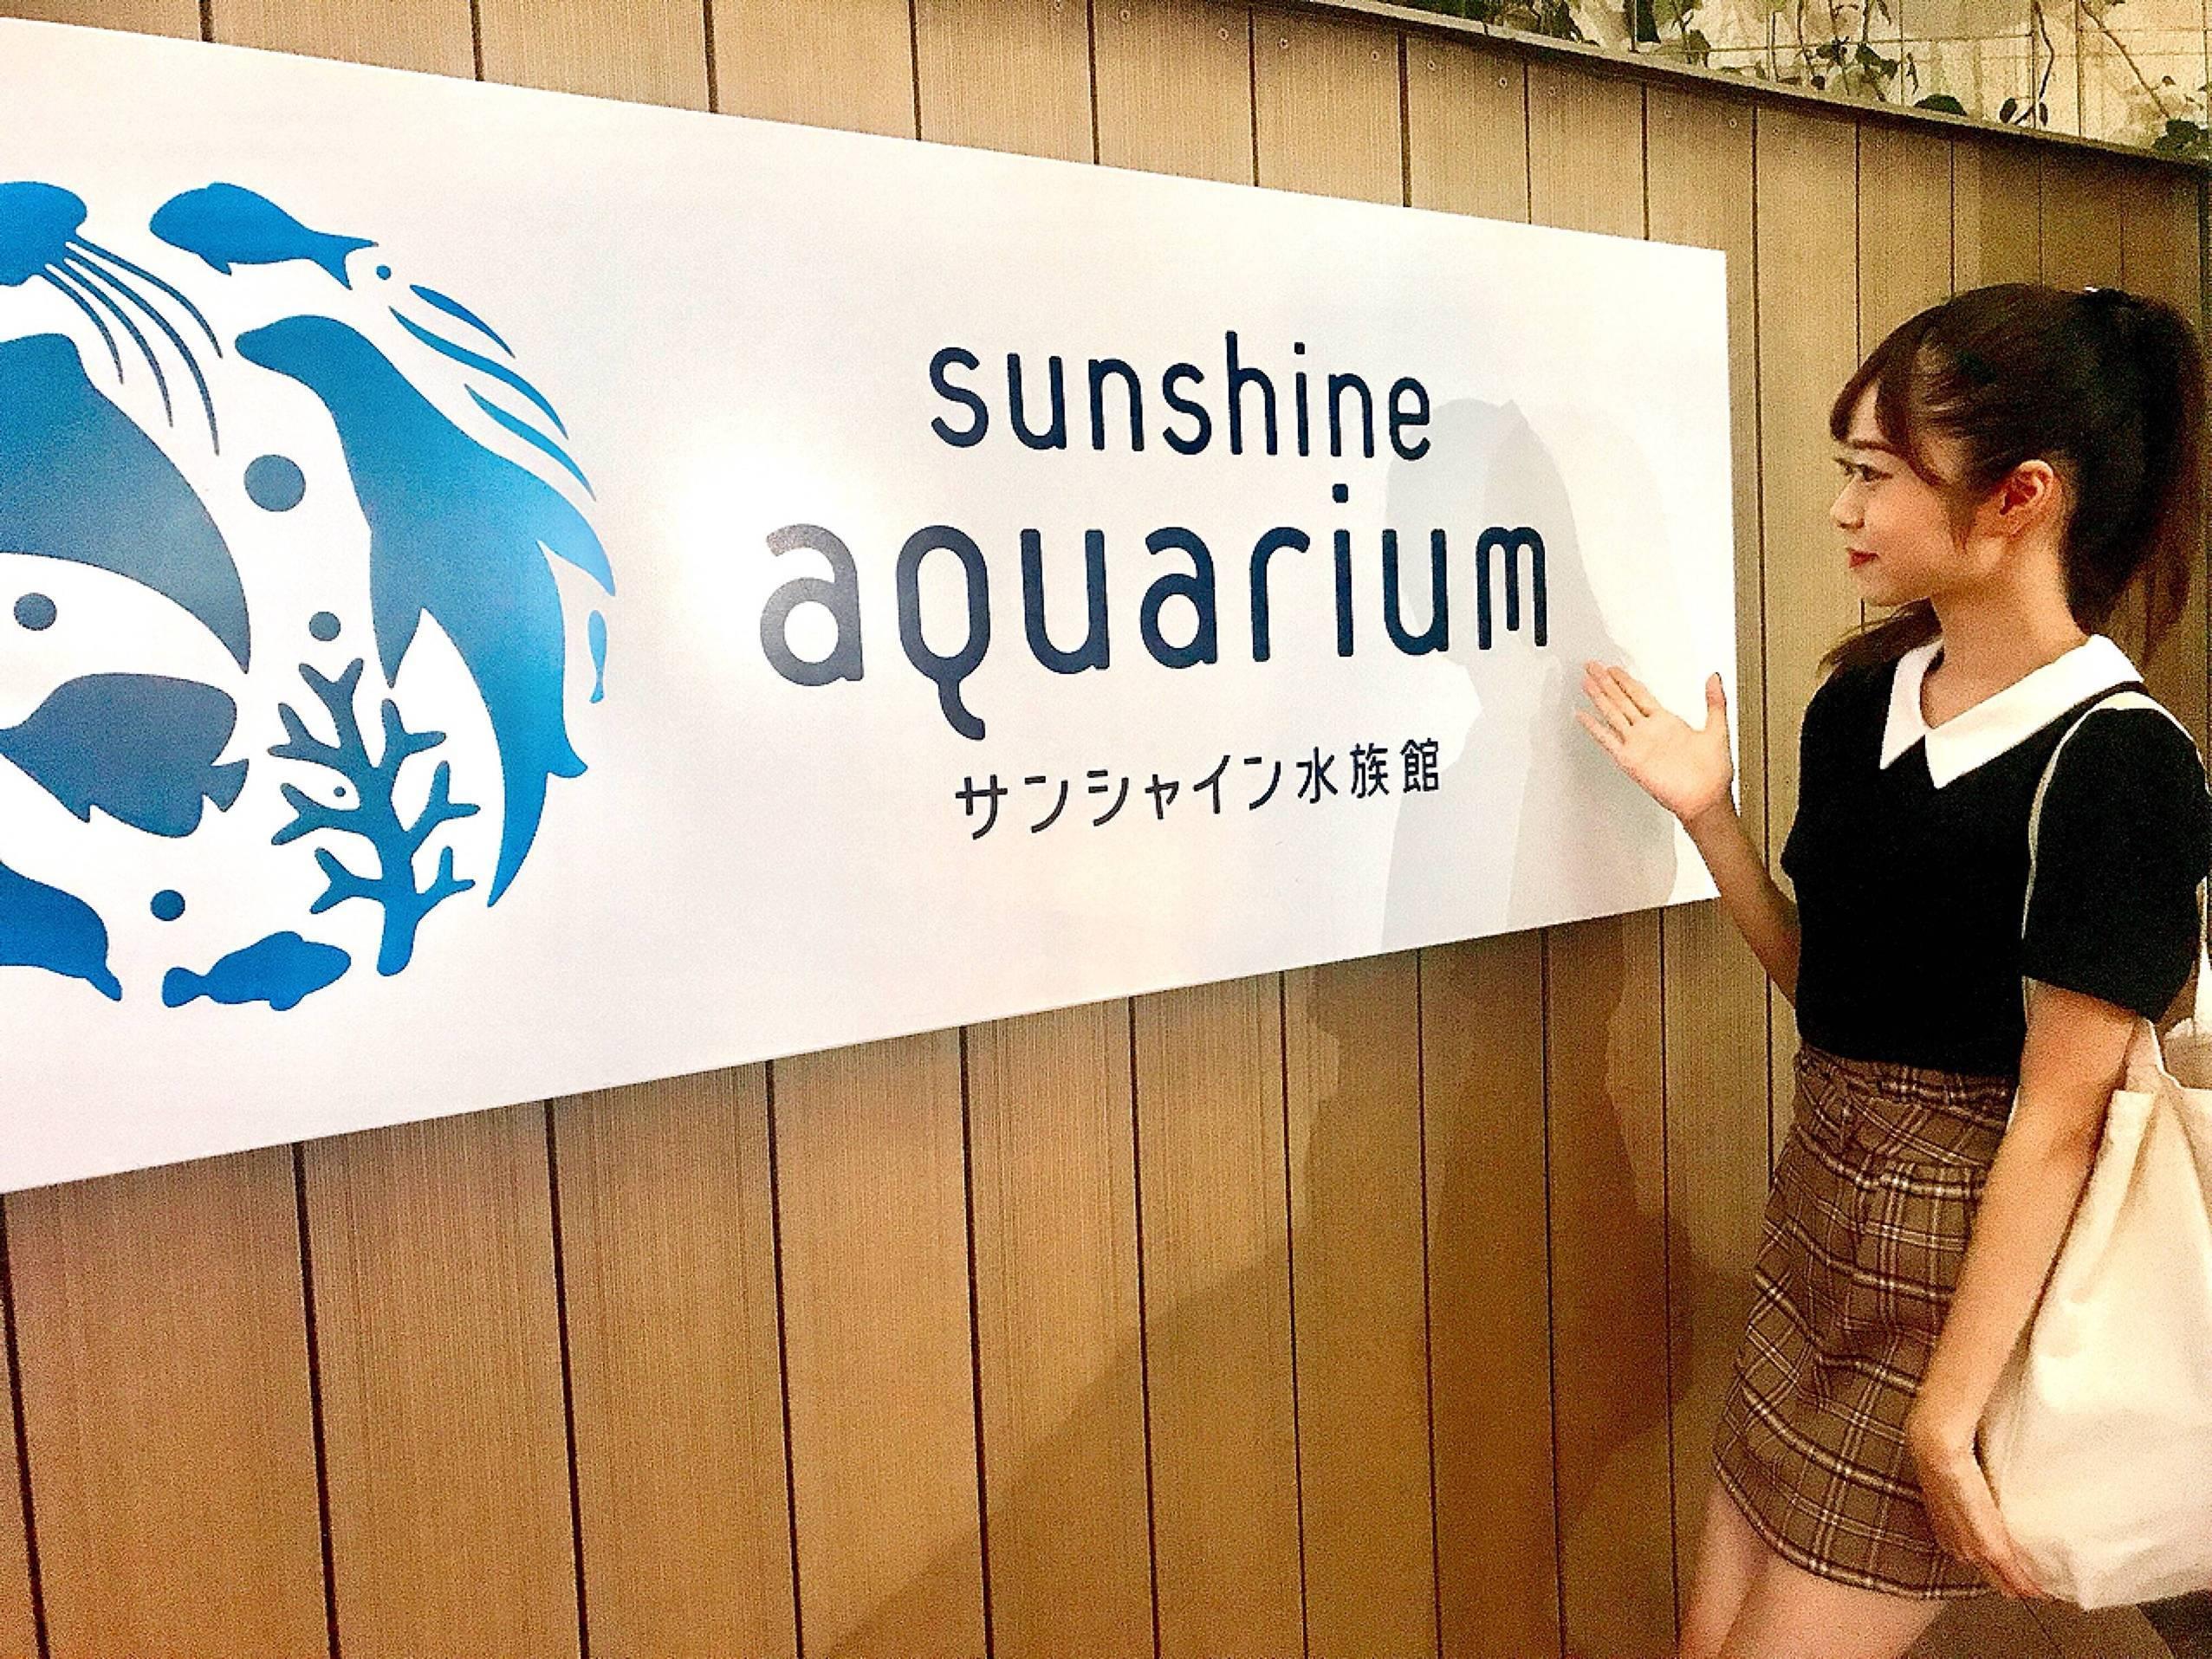 Vol.24♡ 世界初!空飛ぶペンギン?!【池袋・サンシャイン水族館】_1_1